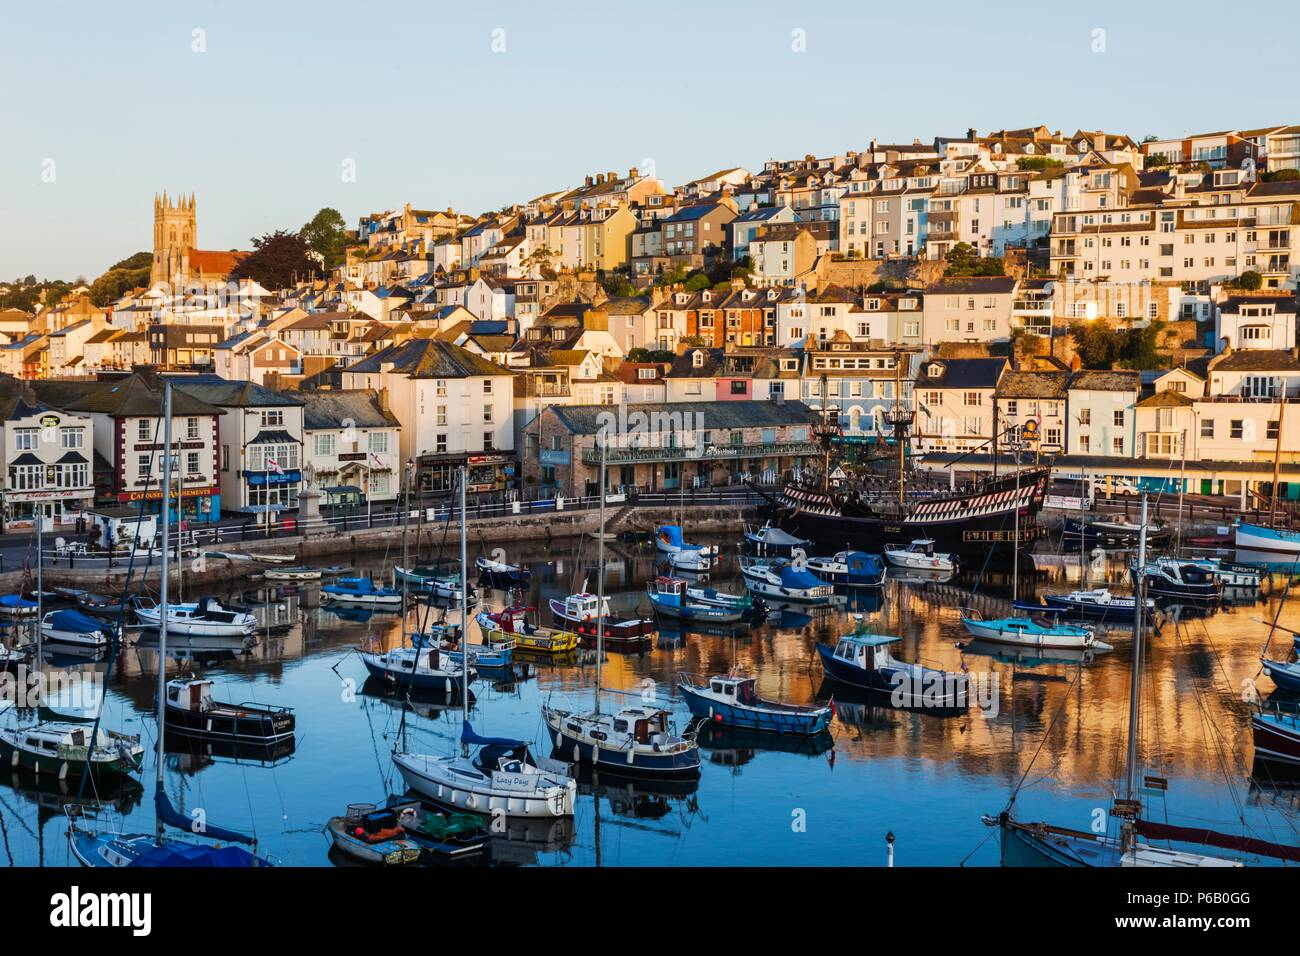 England, Devon, Brixham, Brixham Harbour Stock Photo